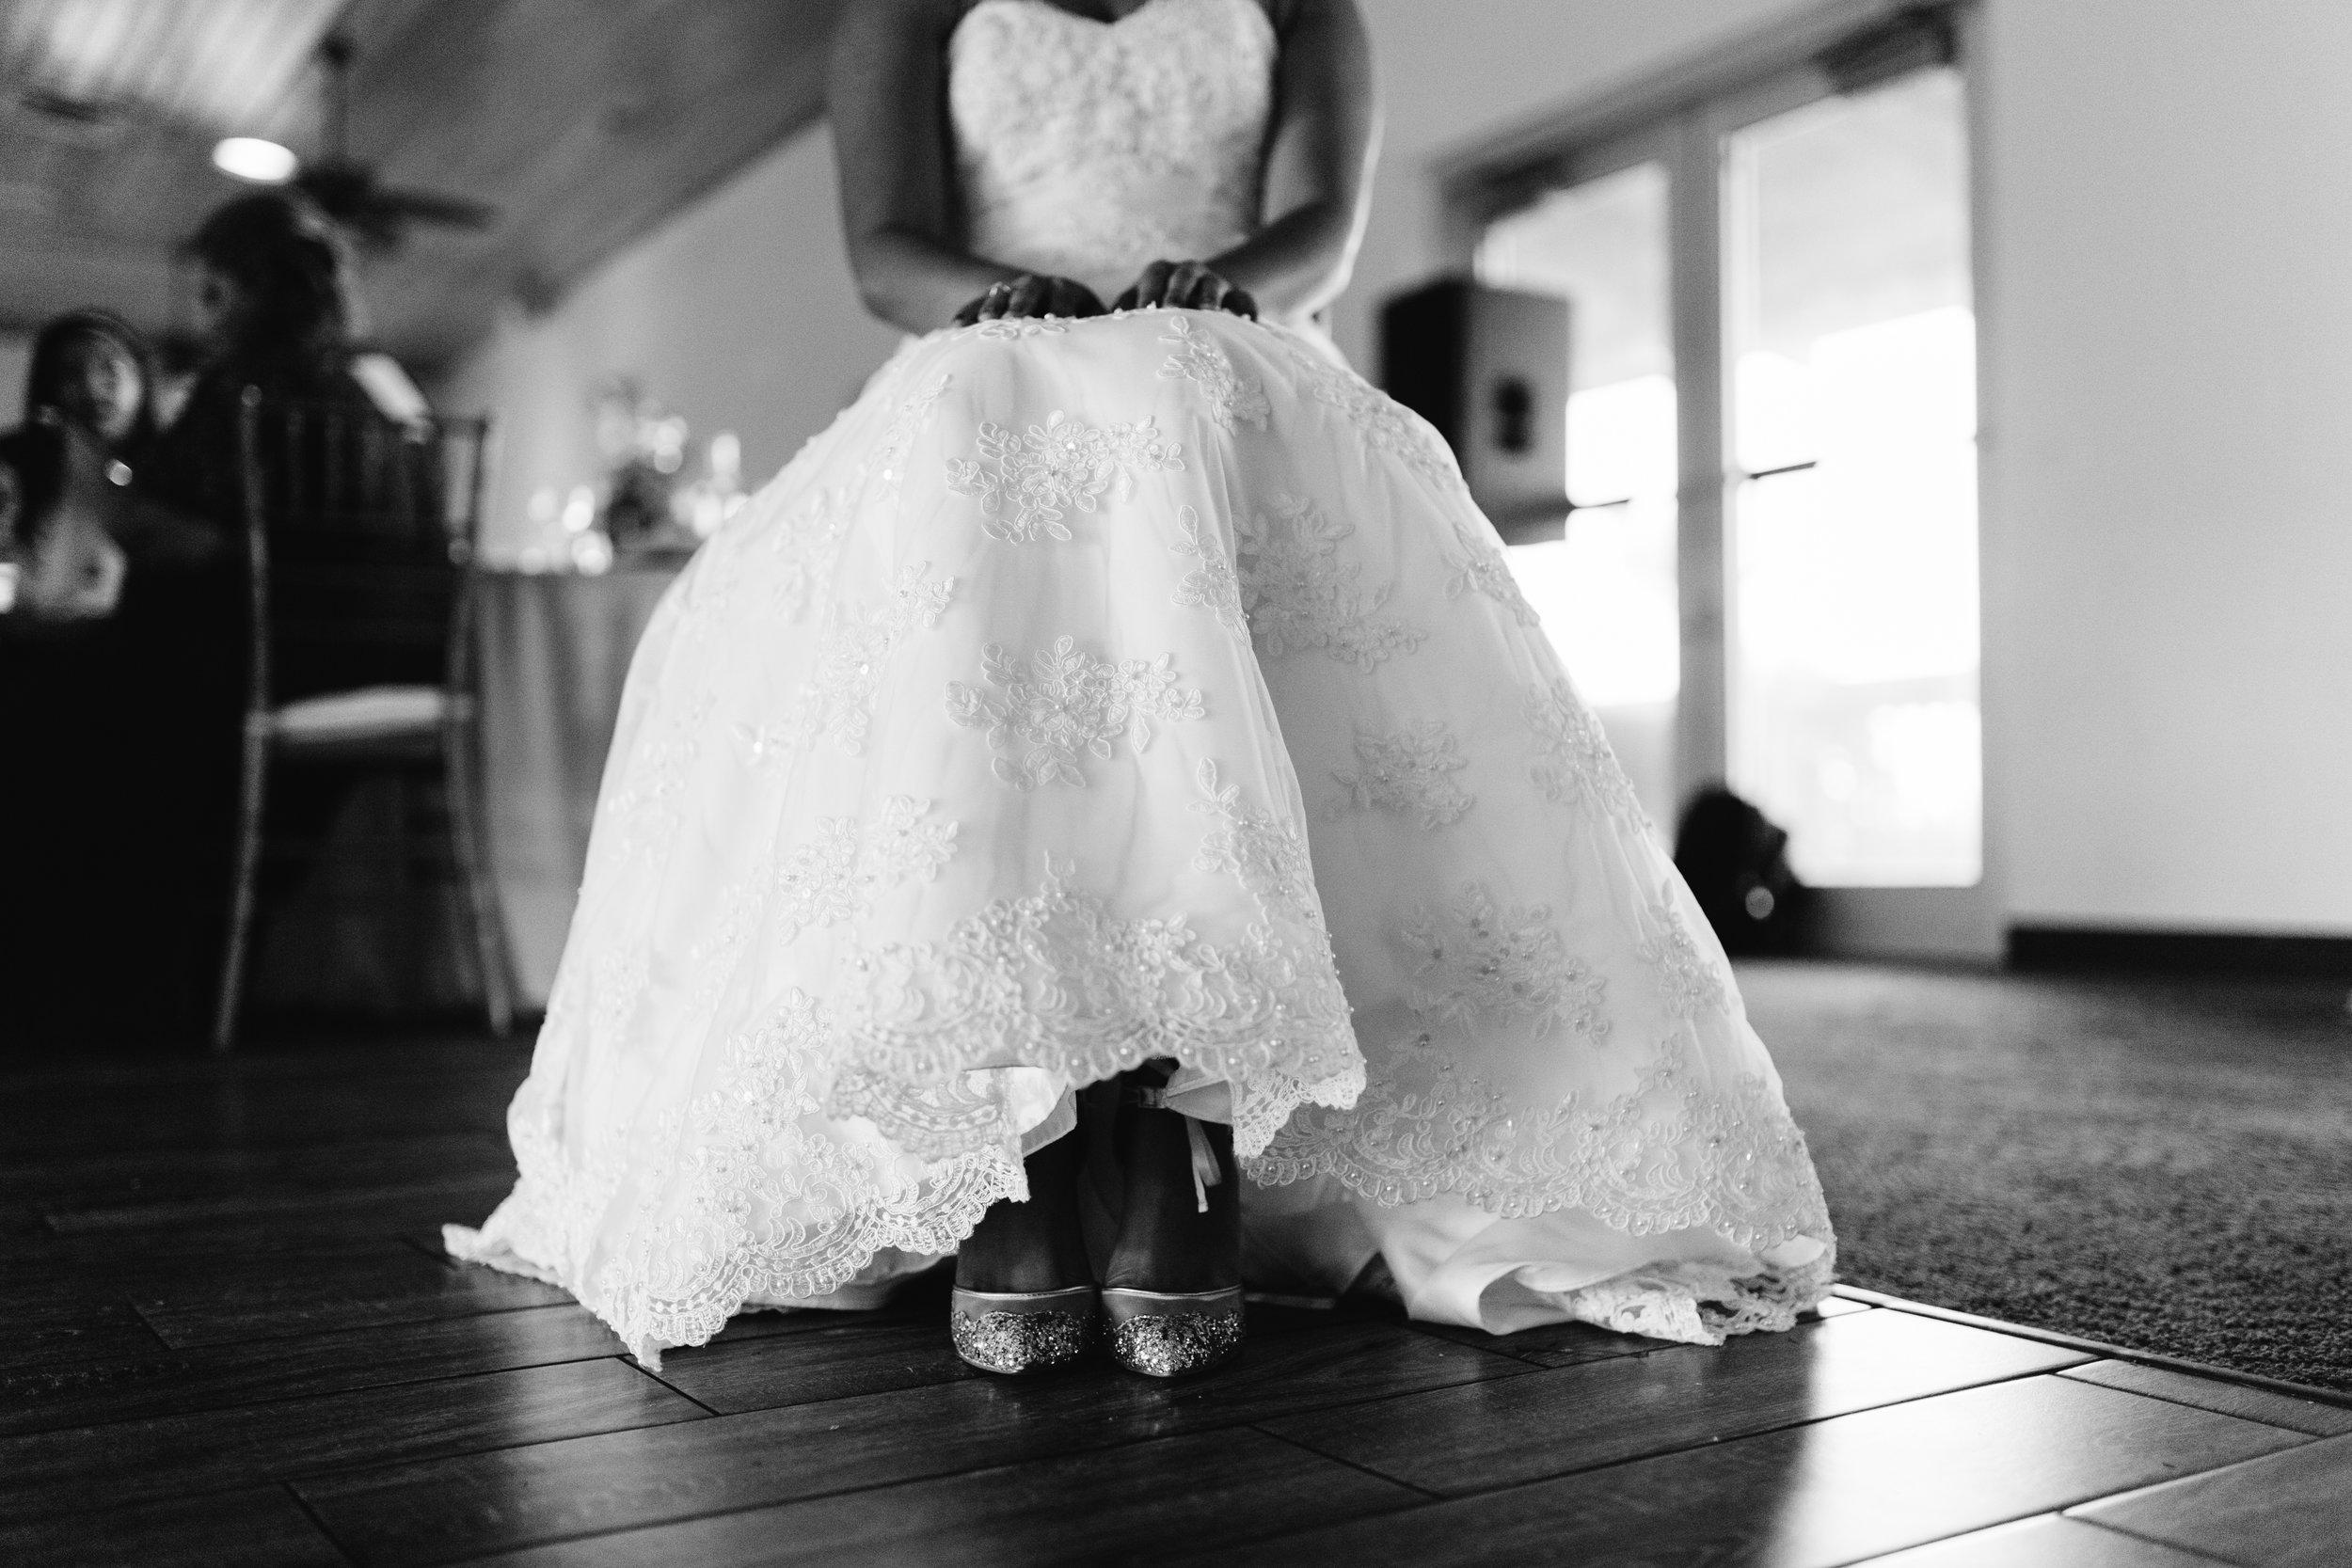 2017.05.23 Barbara and Mauricio Sales Port St Lucie Wedding (240 of 772).jpg